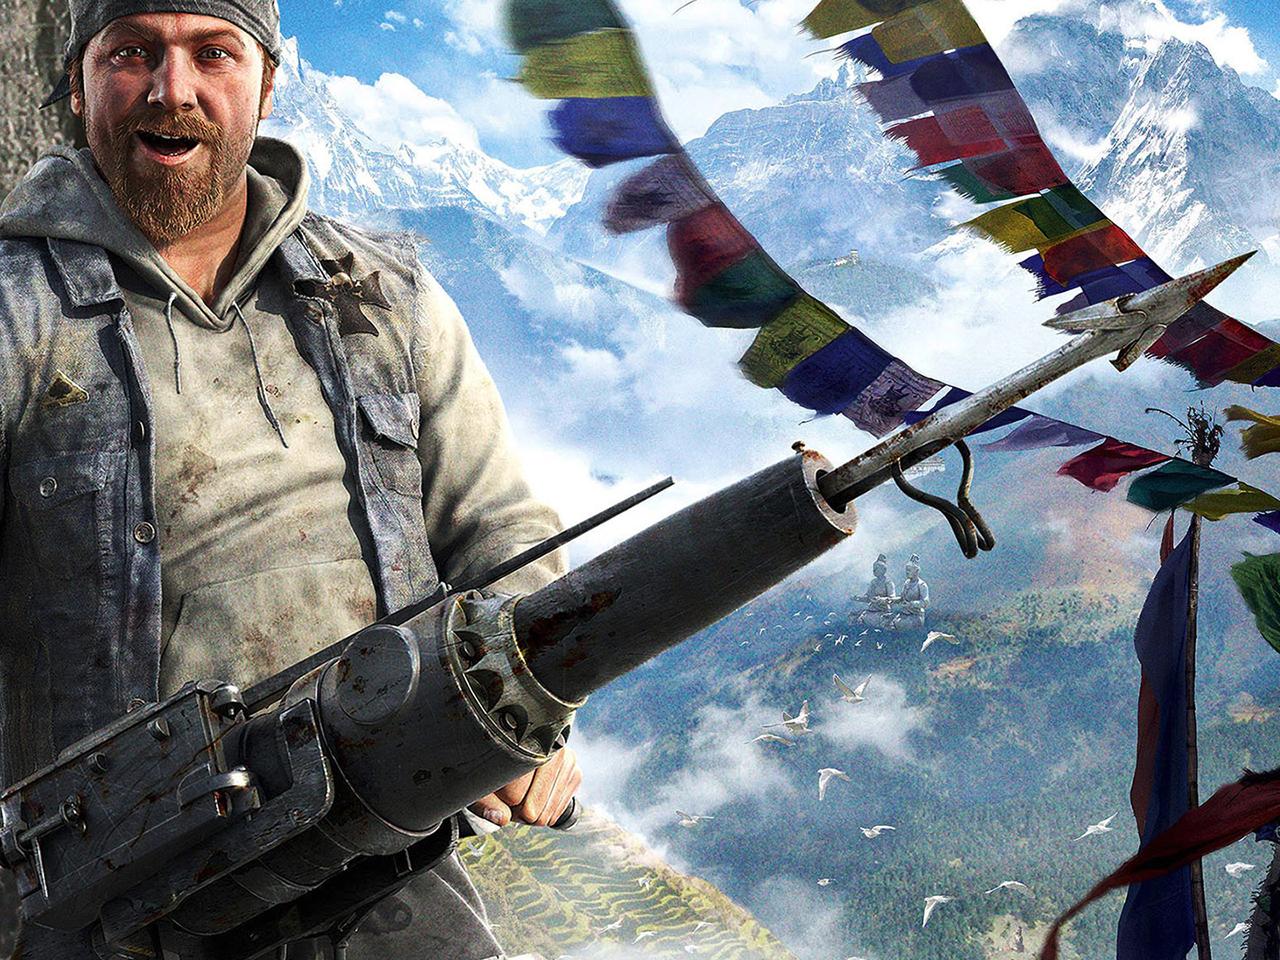 Far Cry 4 Full HD Wallpaper and Hintergrund  1920x1080